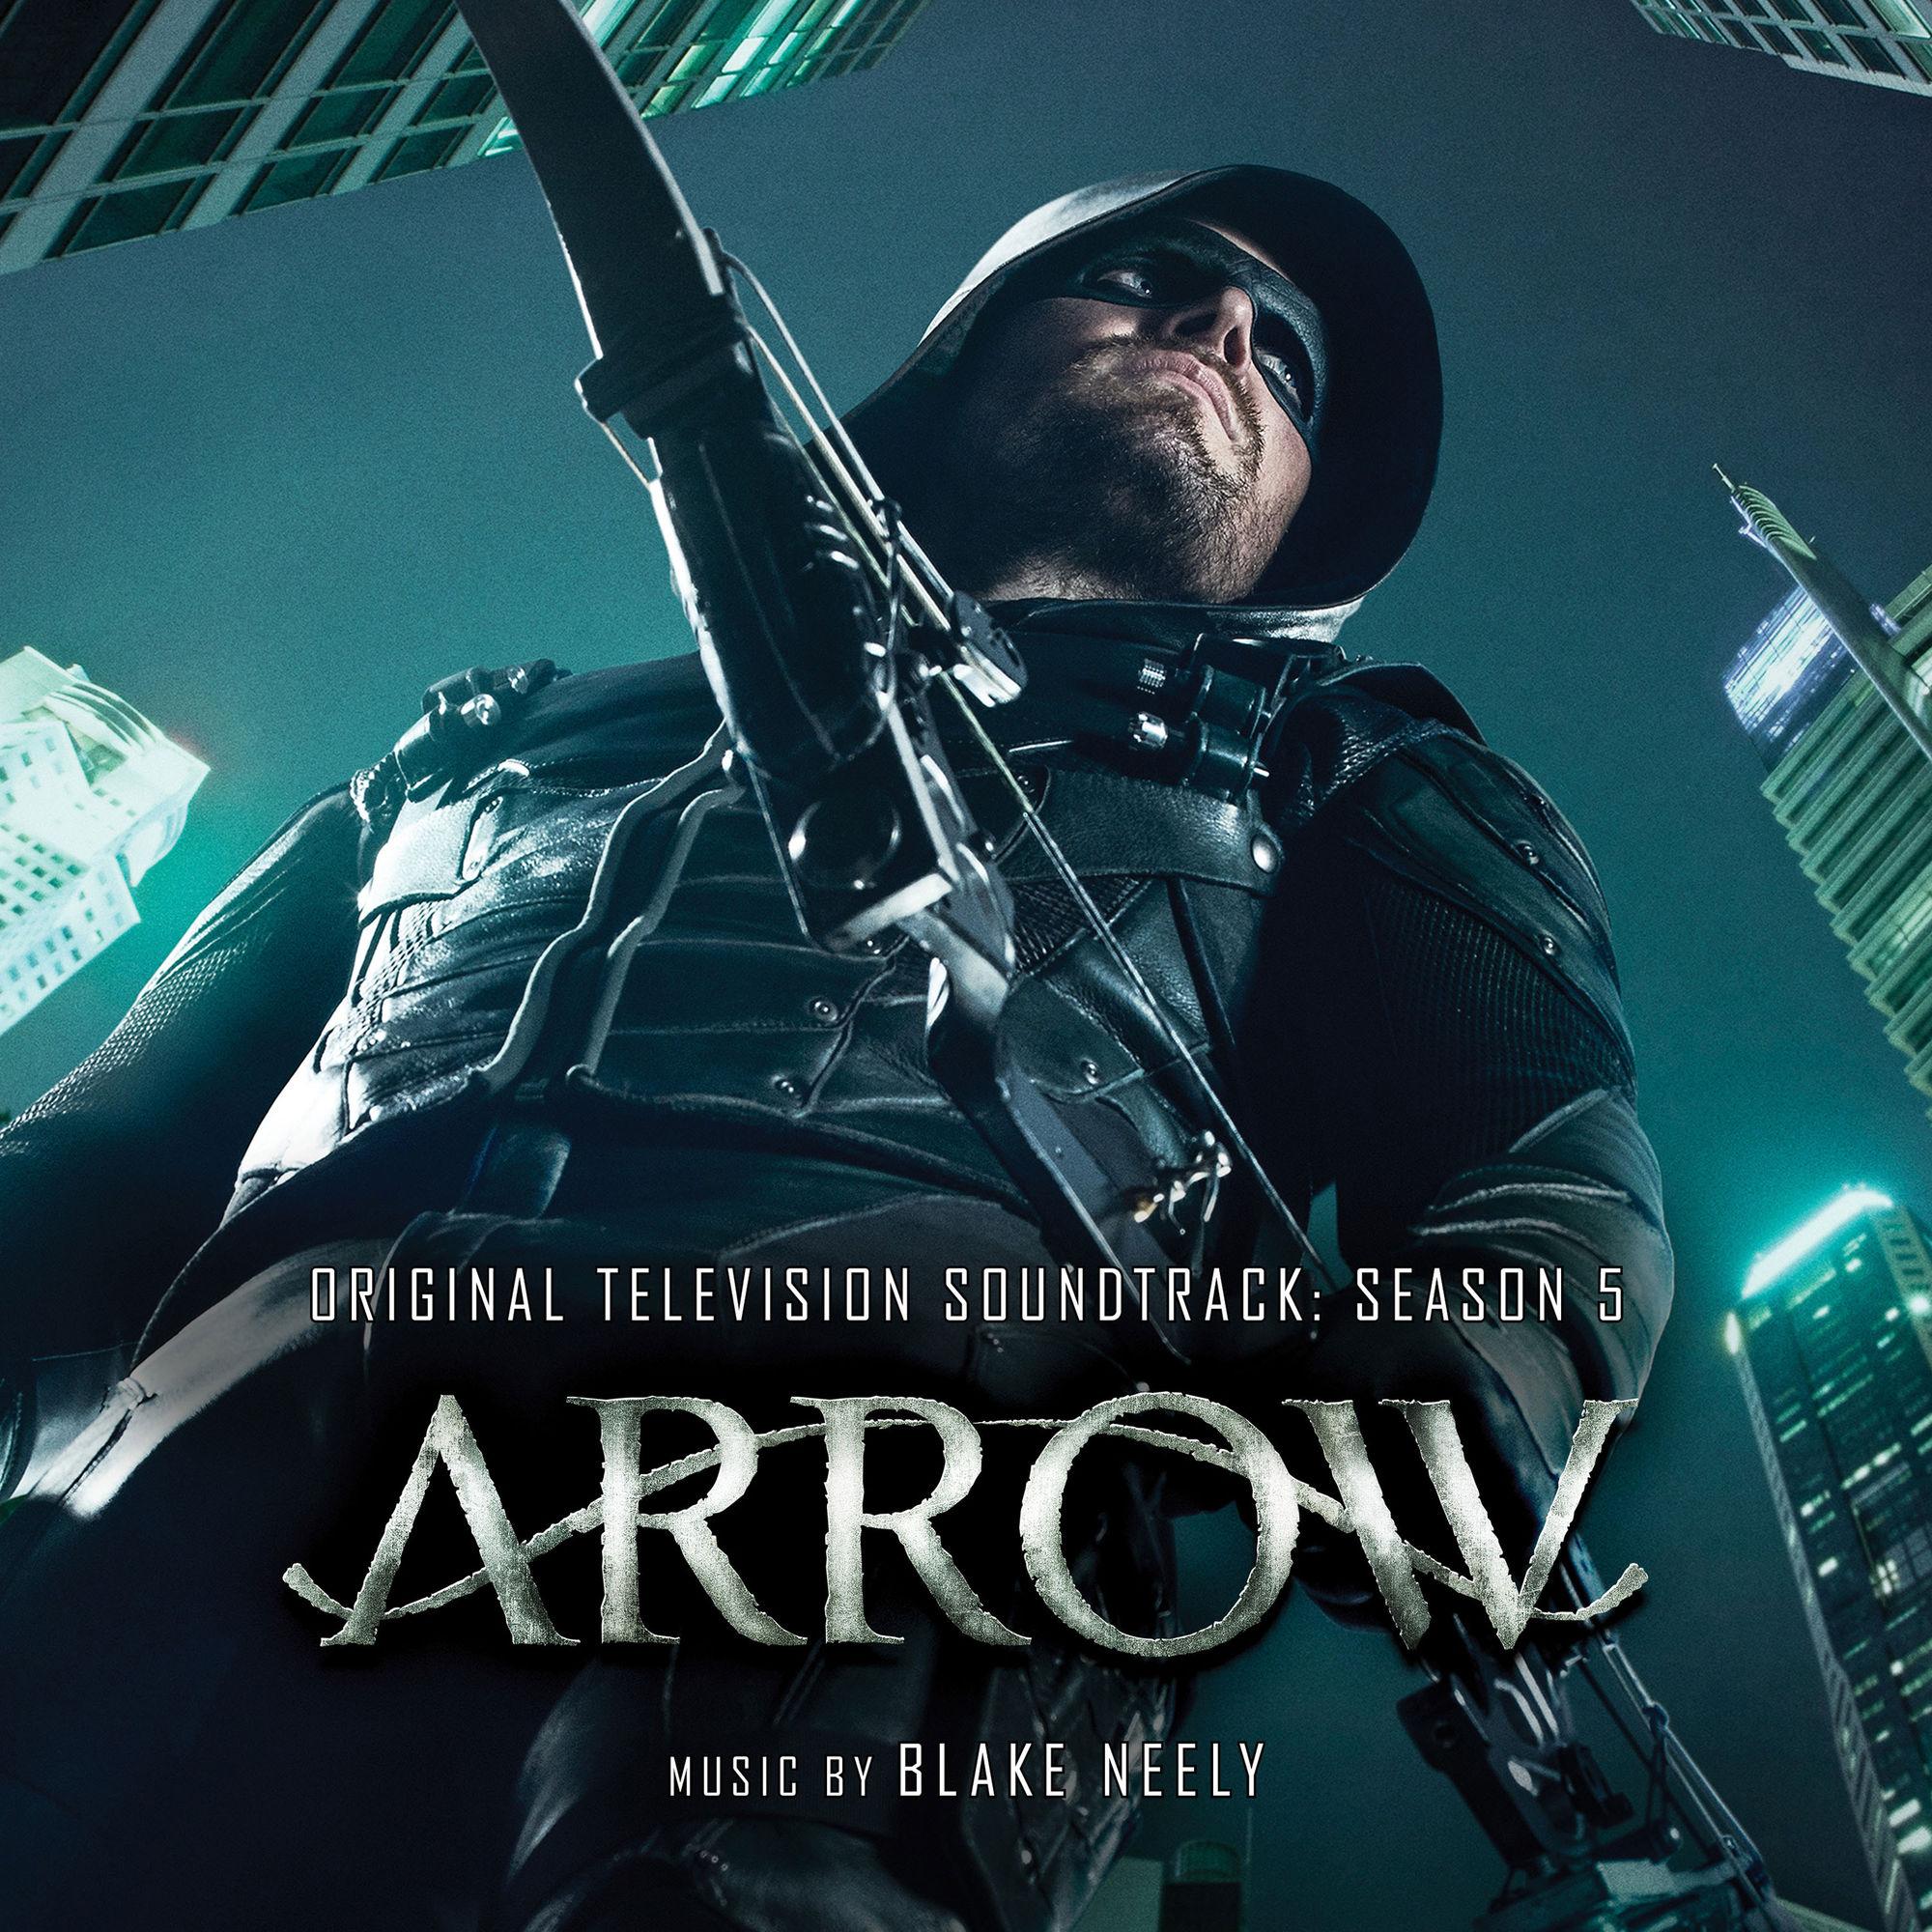 Arrow - Original Television Soundtrack Season 5.png